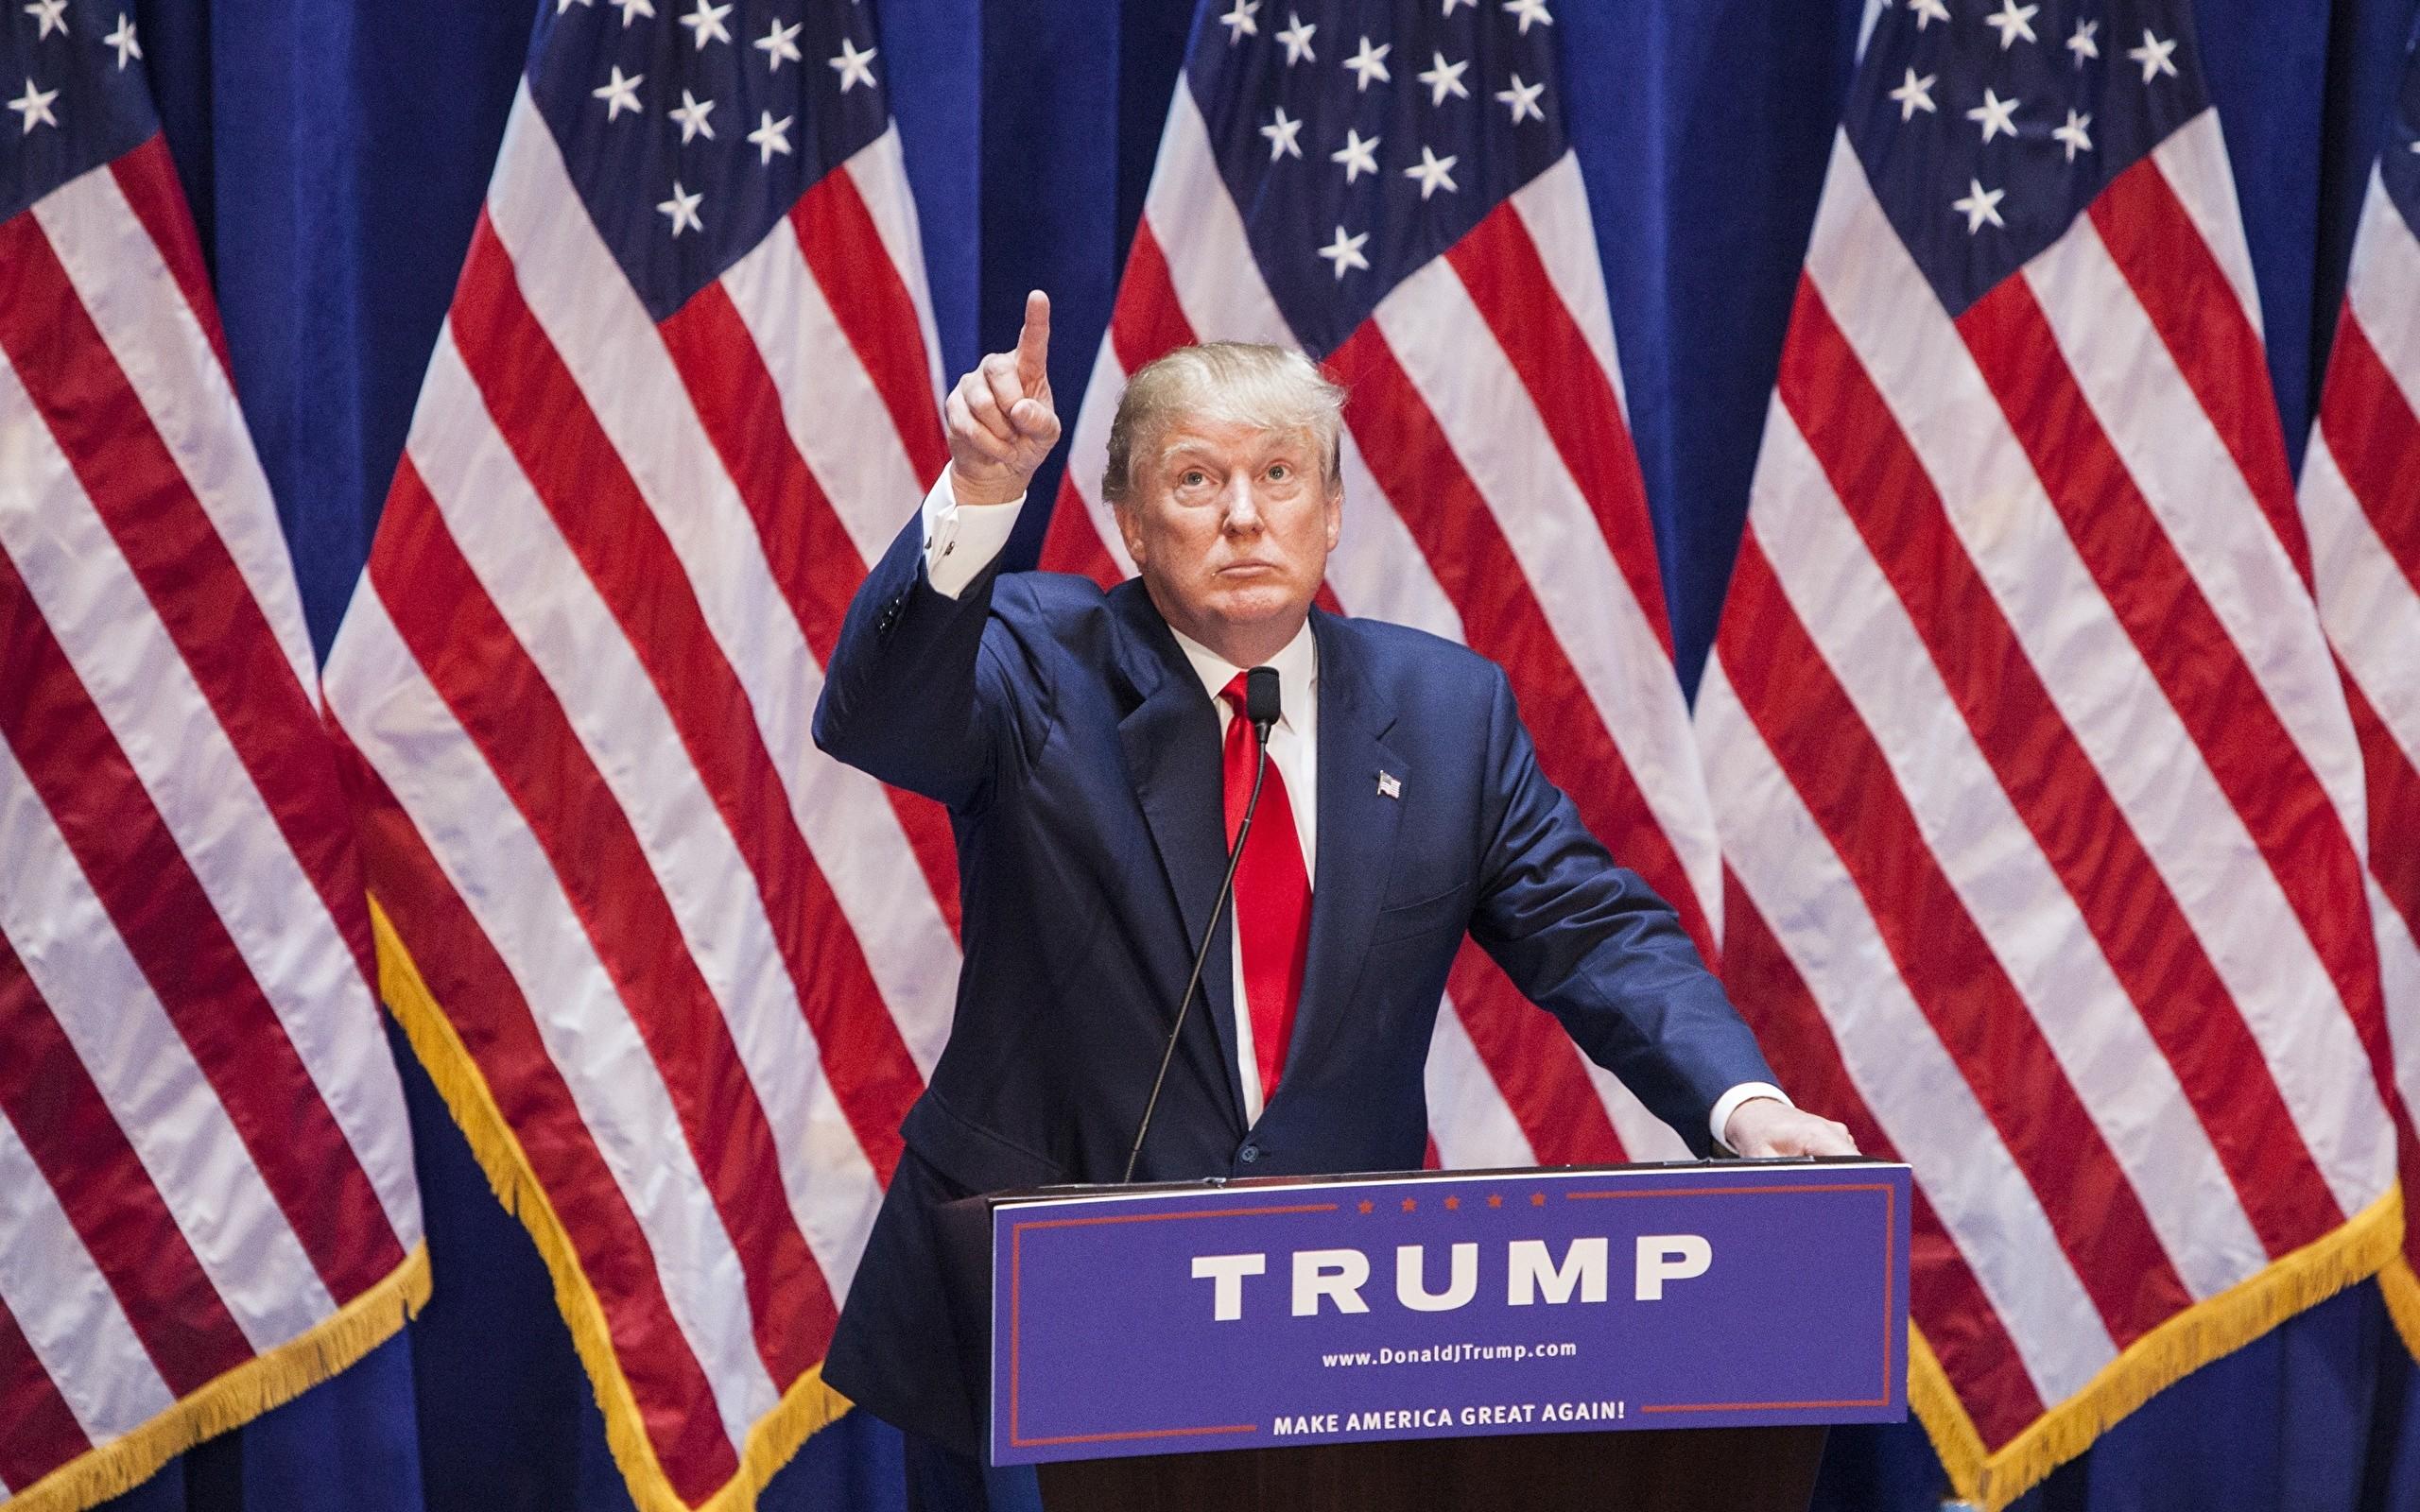 Wallpapers Donald Trump President USA Men Flag Costume Celebrities  Man